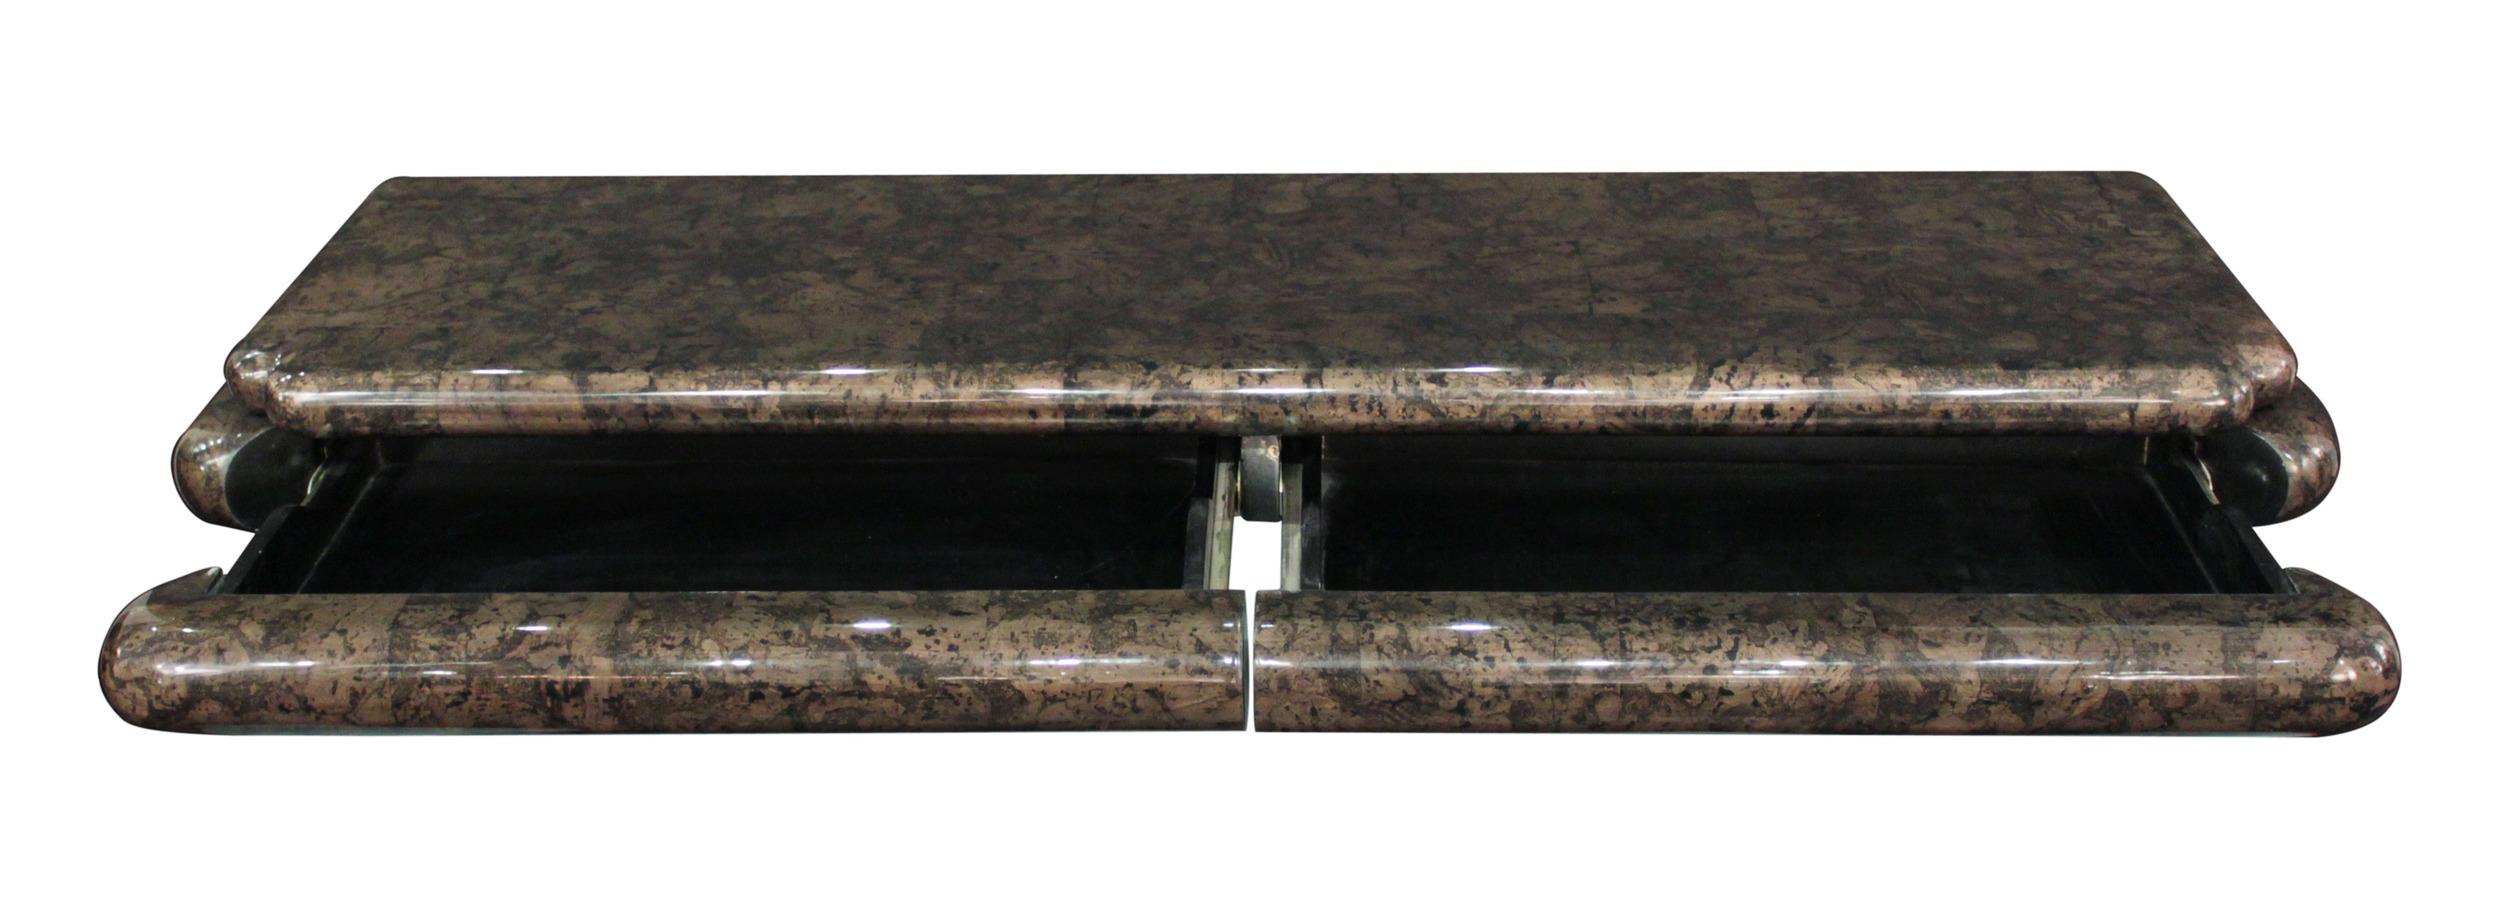 70's 55 lqrd cork consoletable78 drawers hires.jpg